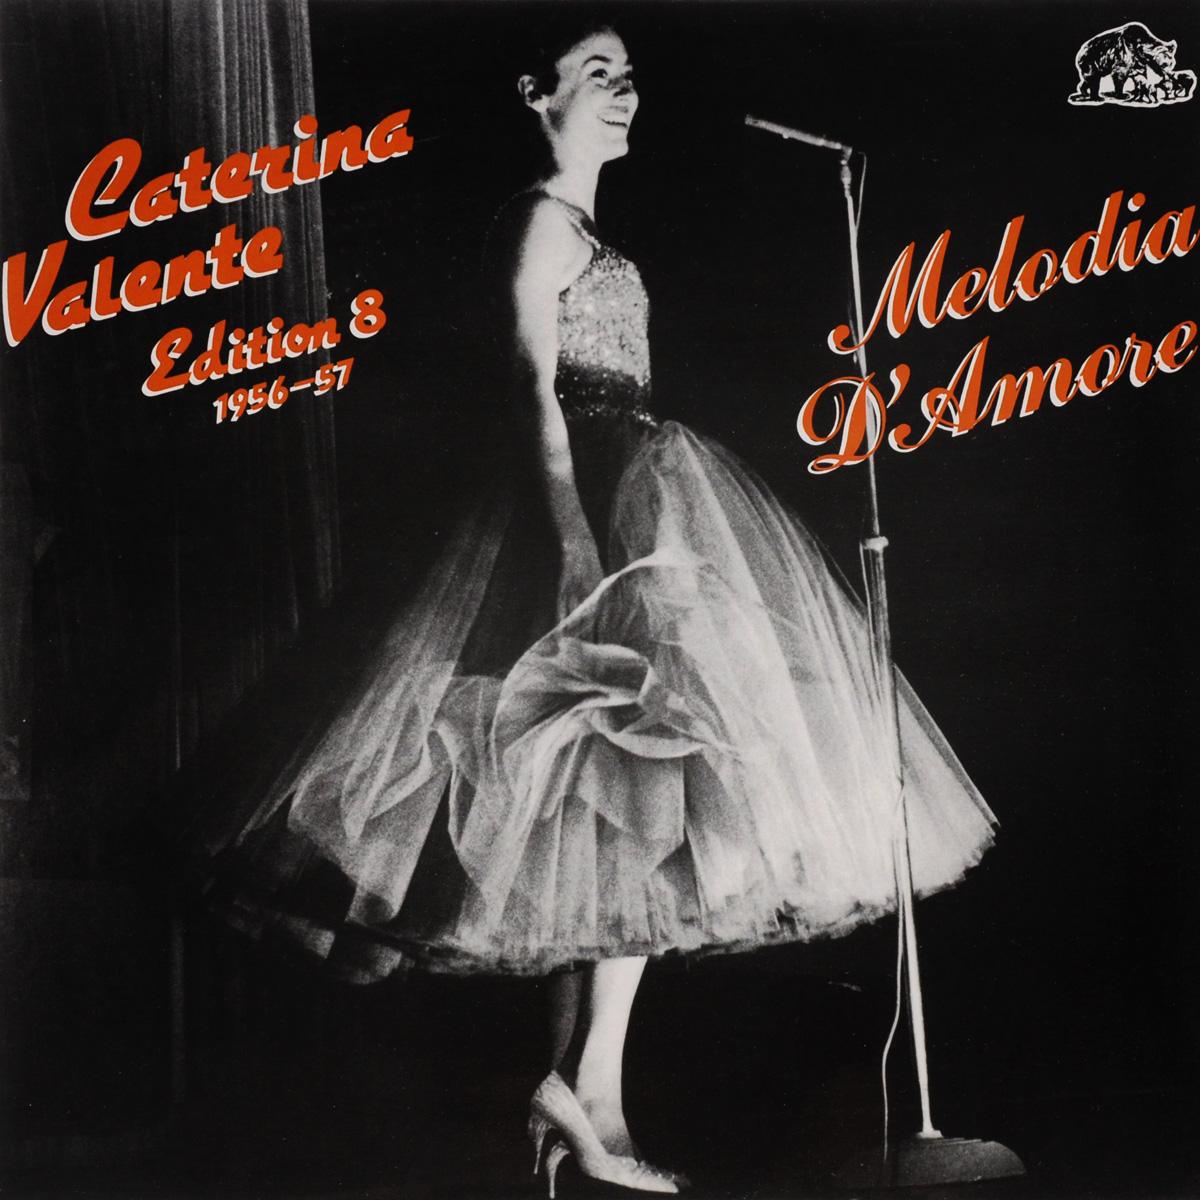 Катерина Валенте Caterina Valente. Edition 8 (1956-1957). Melodia D'Amore (LP) seraph melodia armastus on kohal